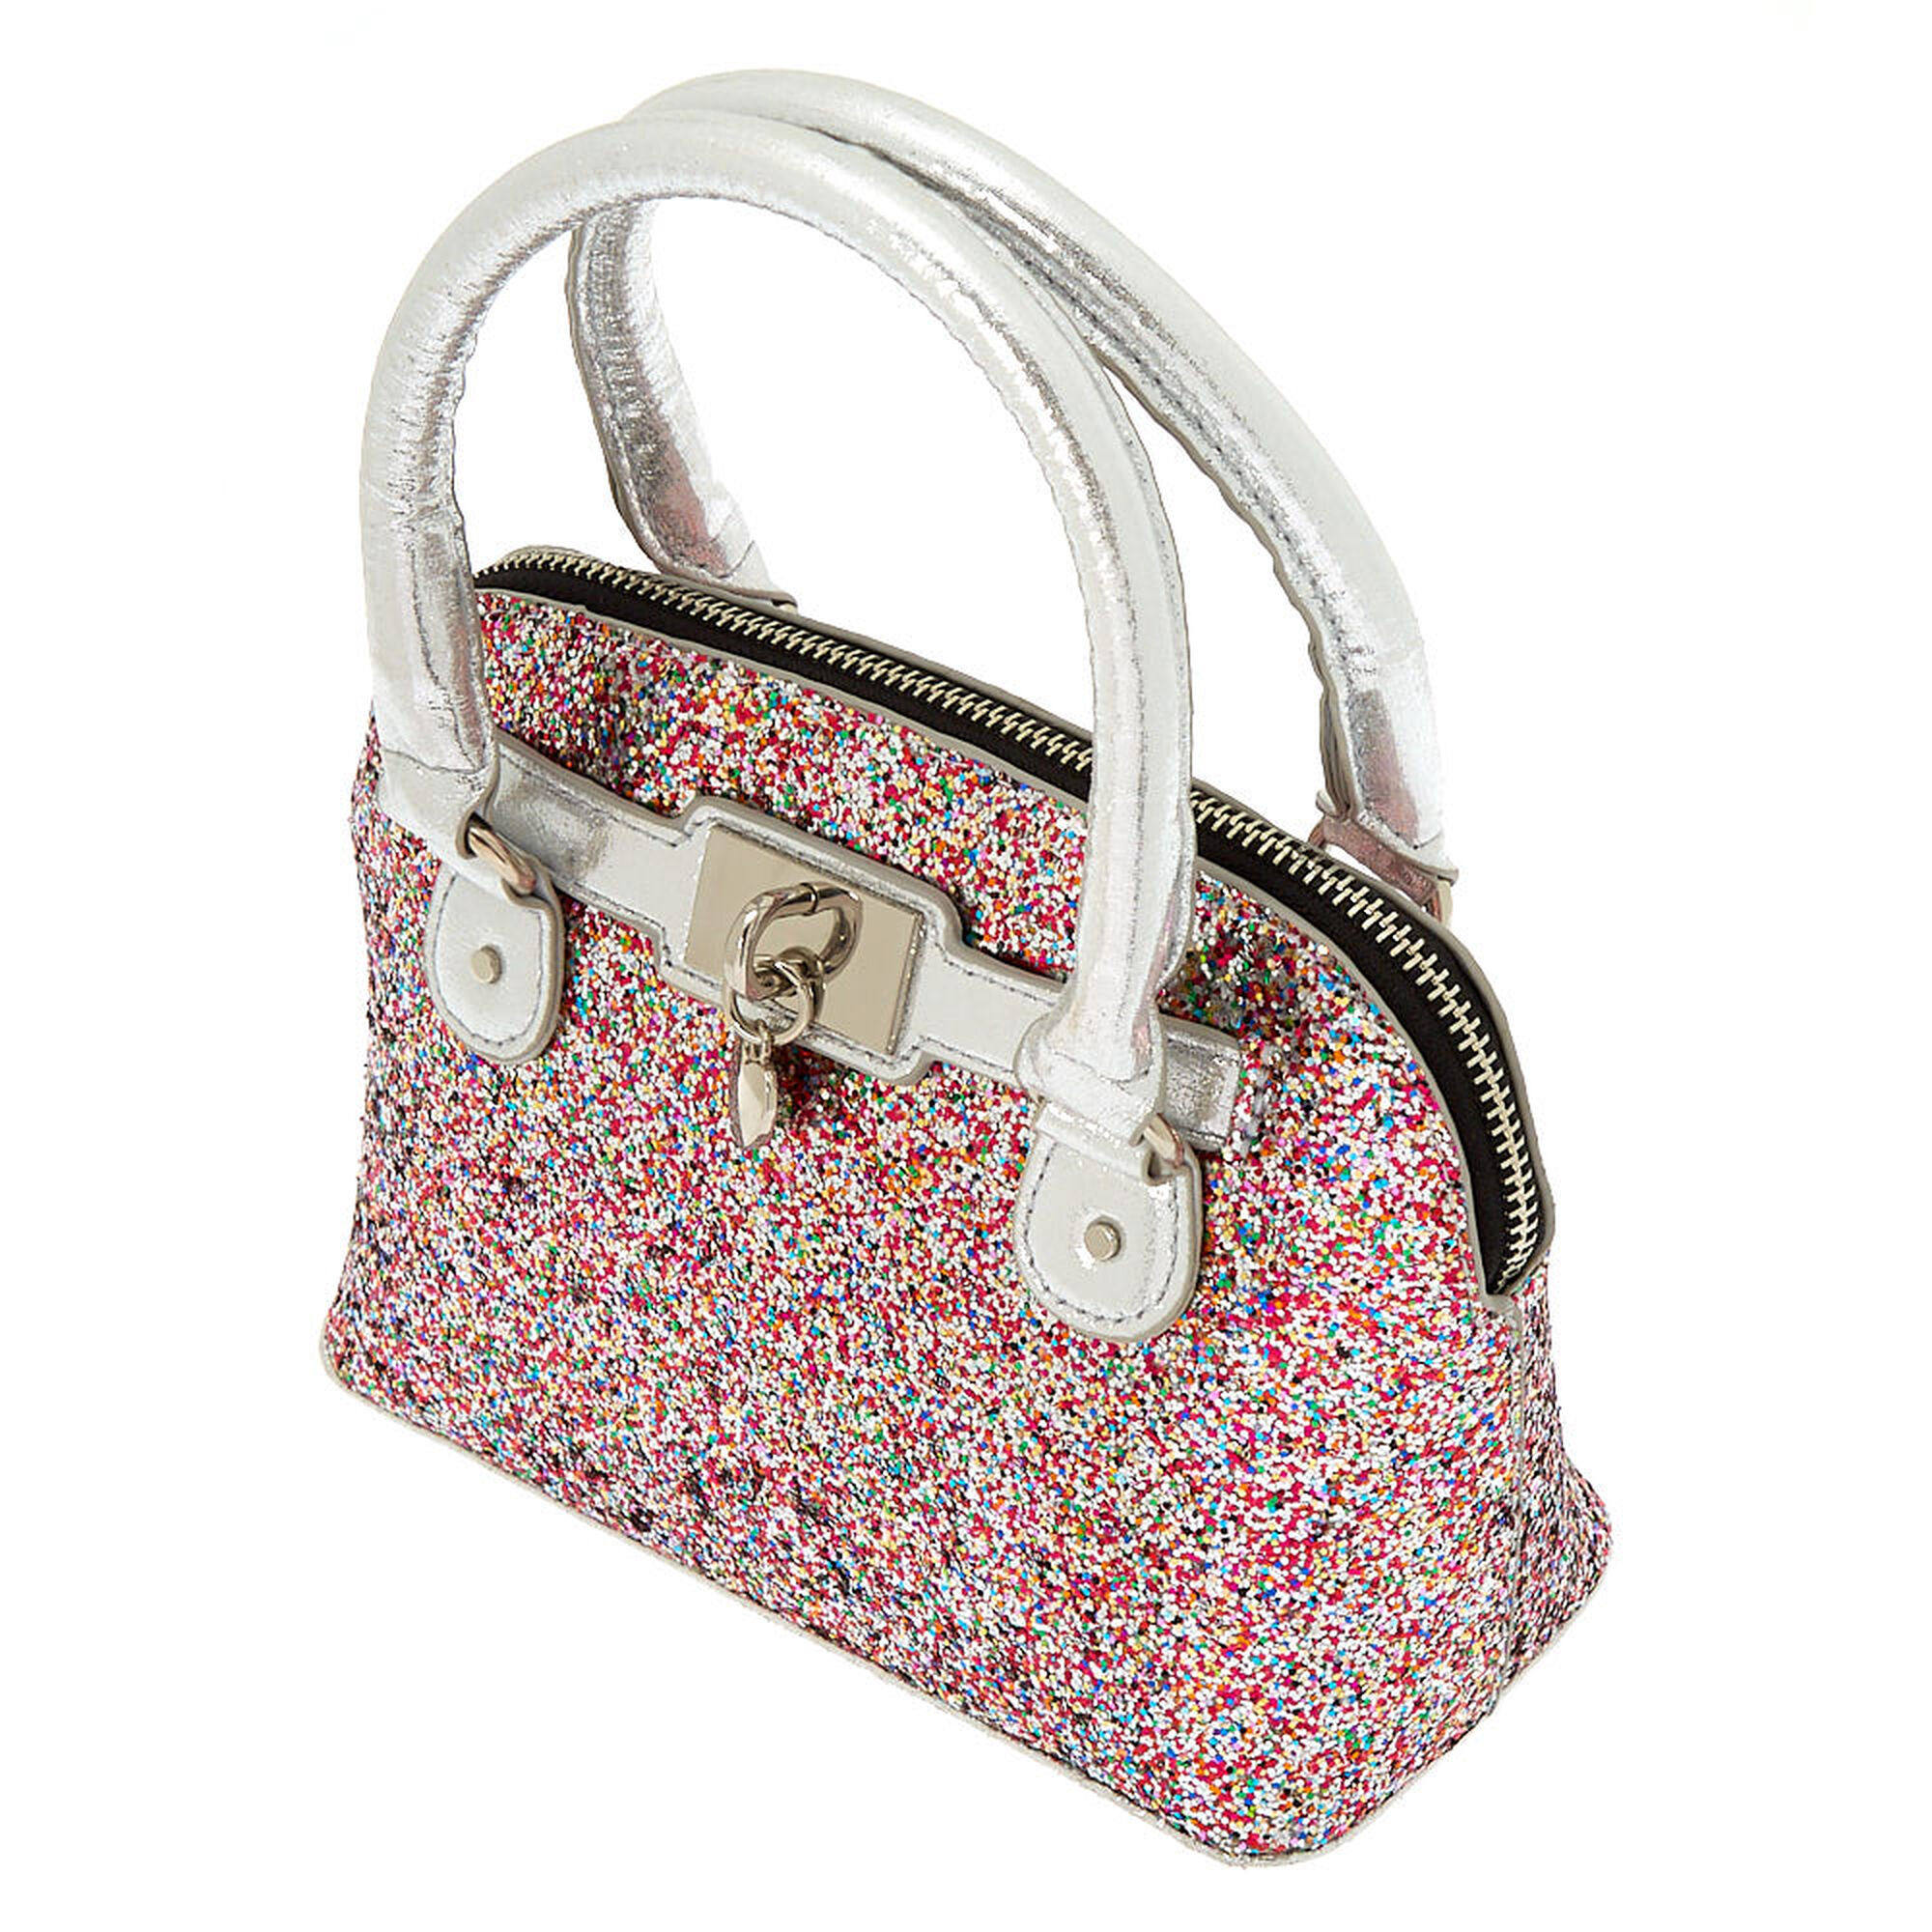 Rainbow Glitter Mini Satchel Crossbody Bag Silver